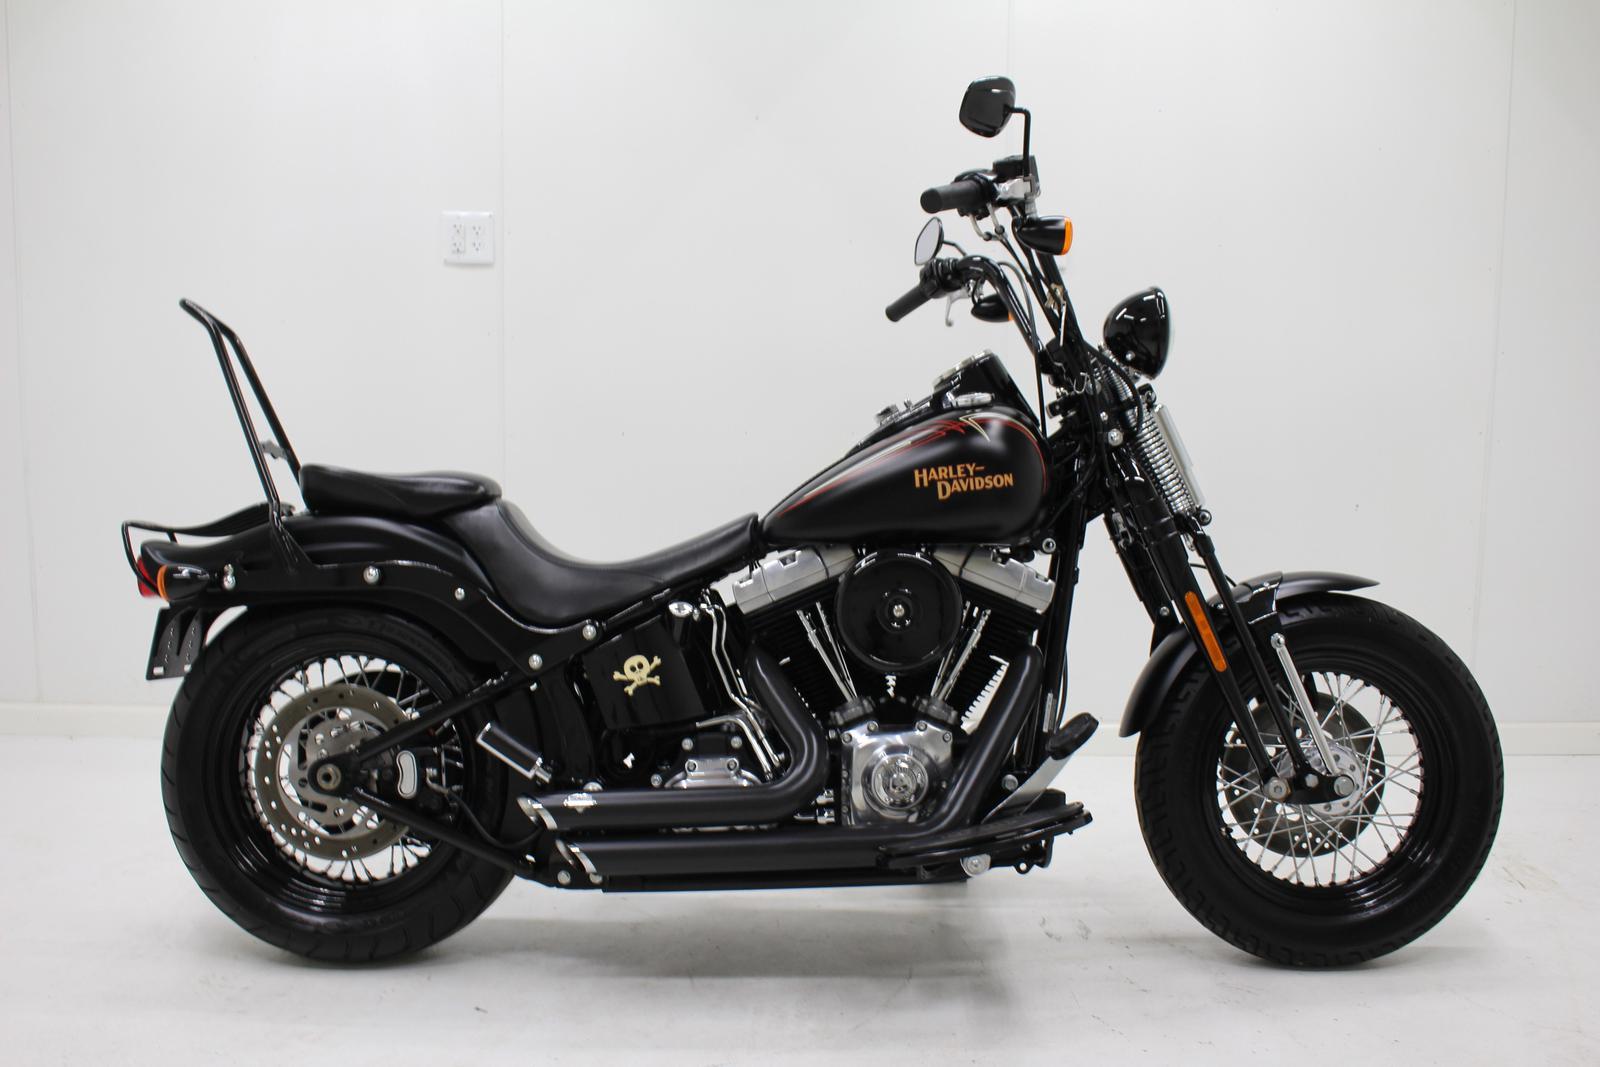 2009 Harley-Davidson® SOFTAIL CROSS BONES for sale in Paducah, KY